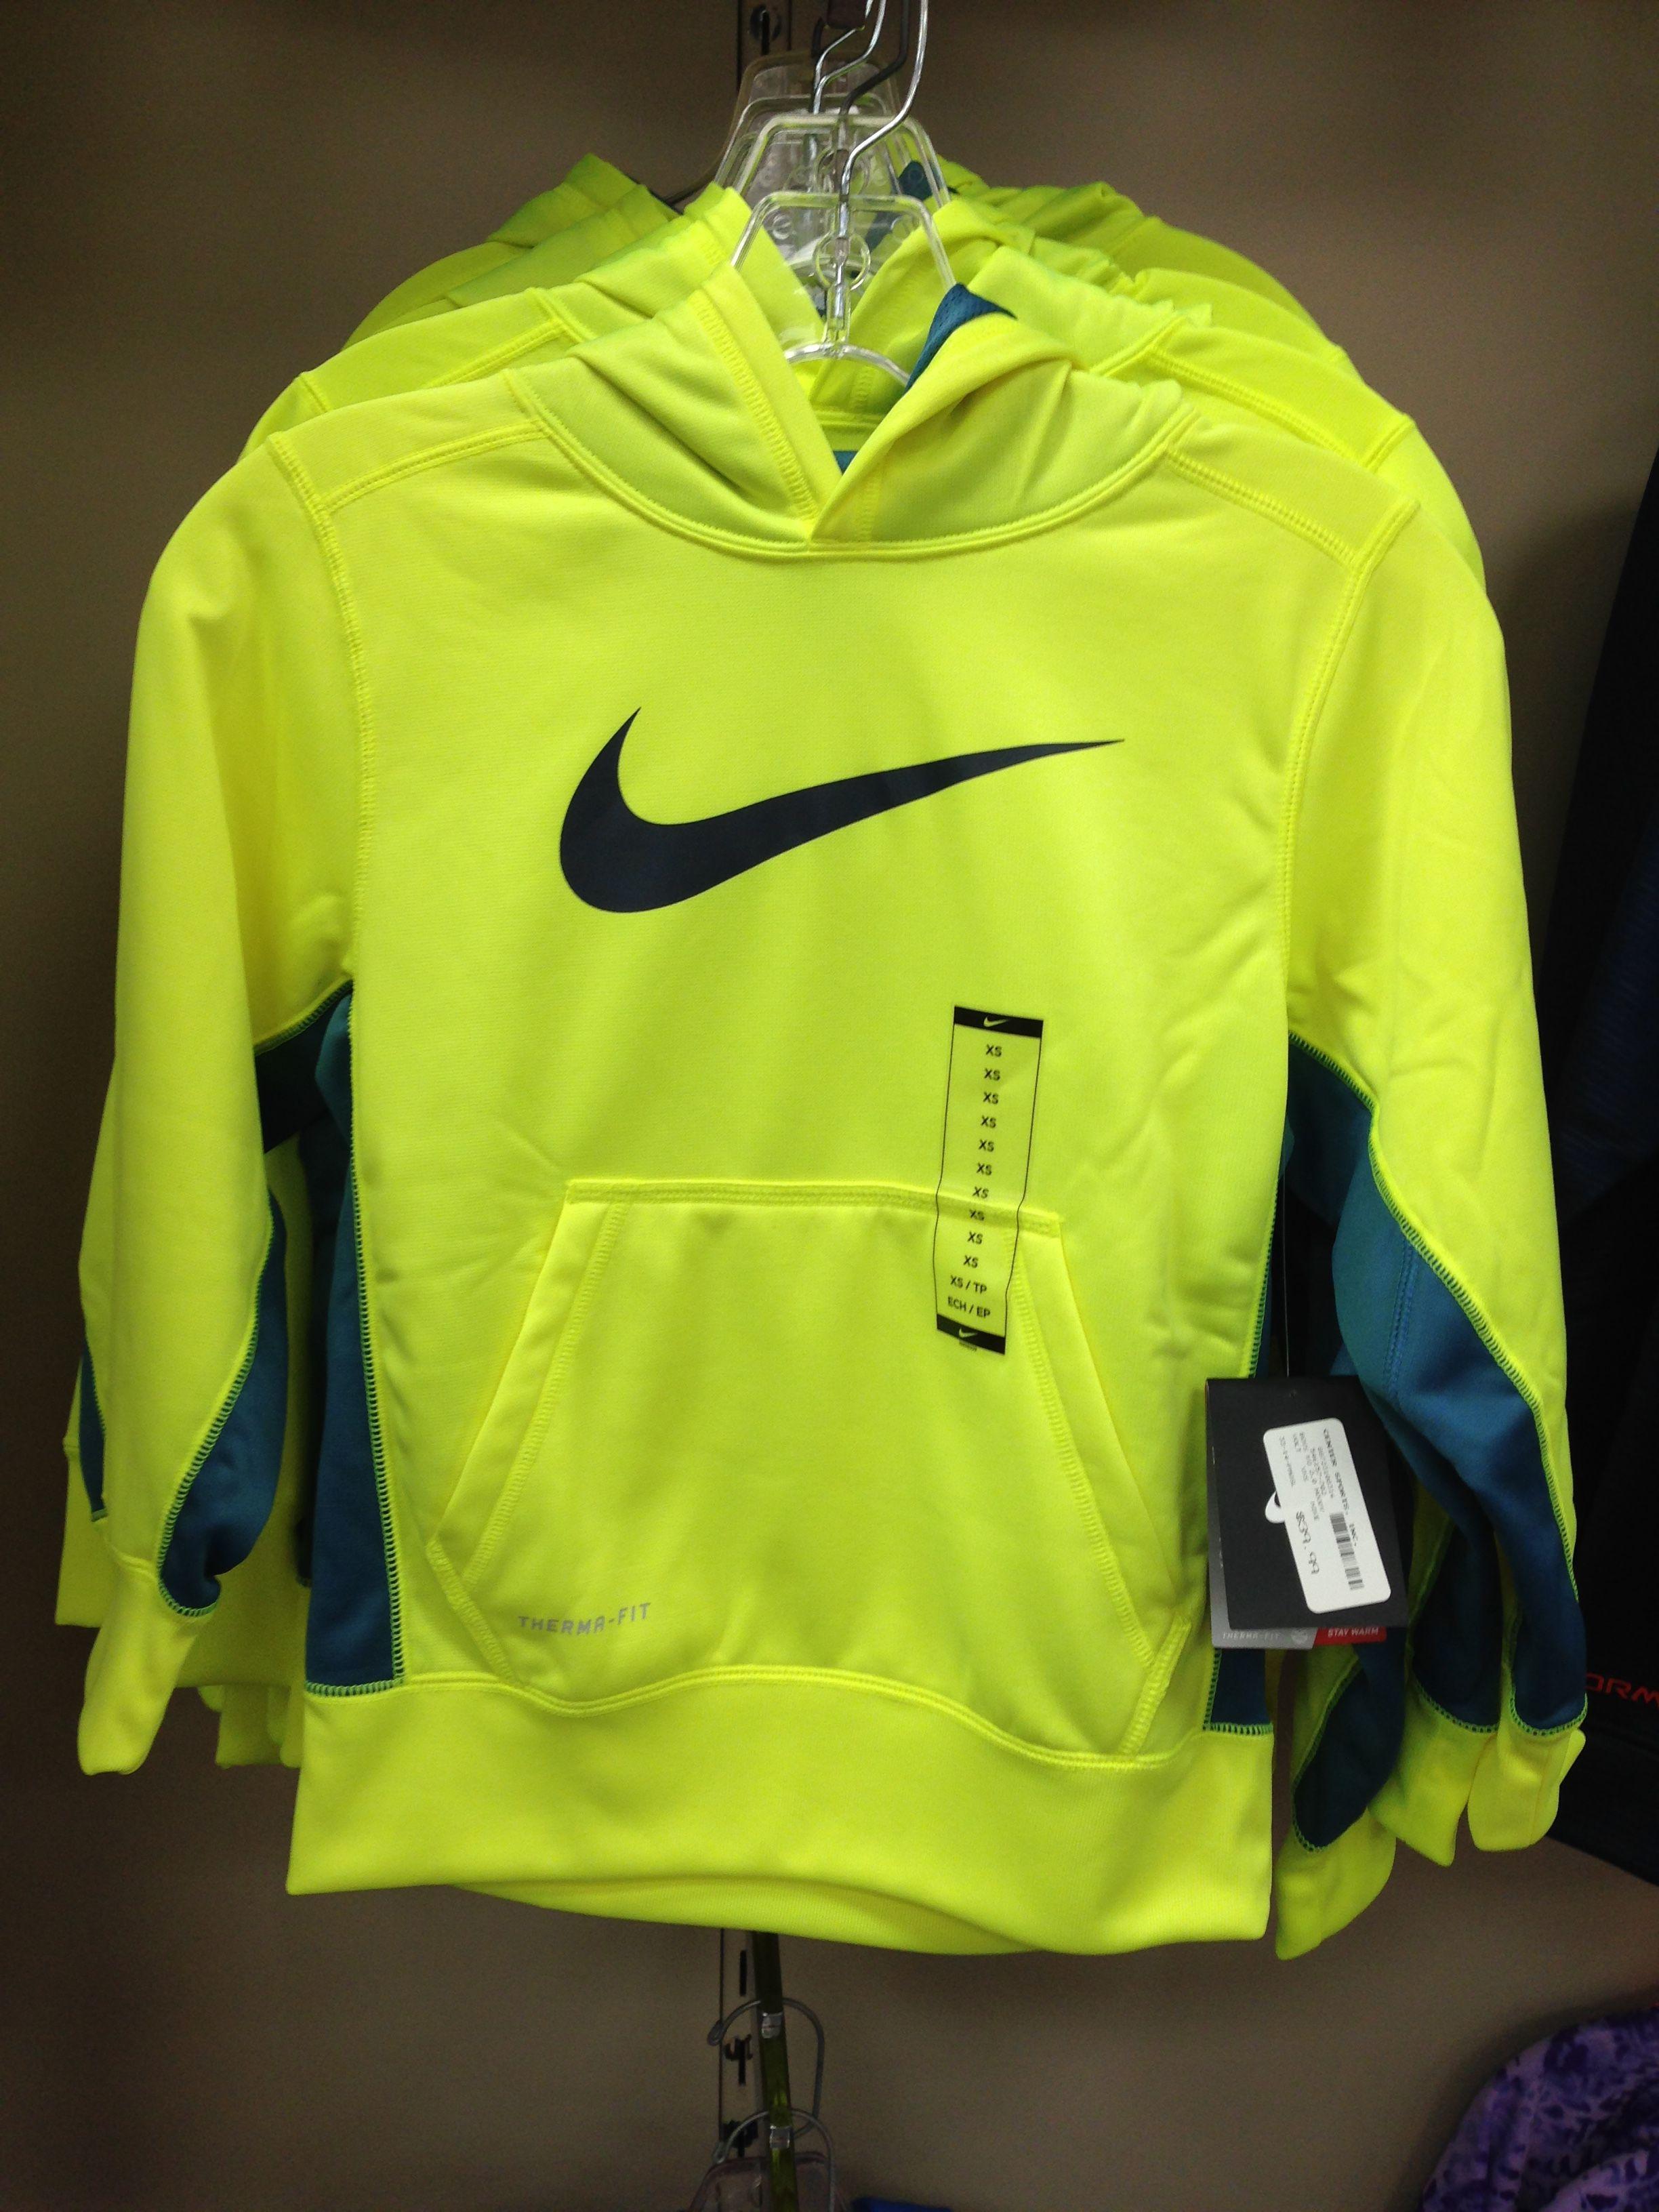 Youth Nike Sweatshirt, Neon Yellow and Gray | Kids outfits